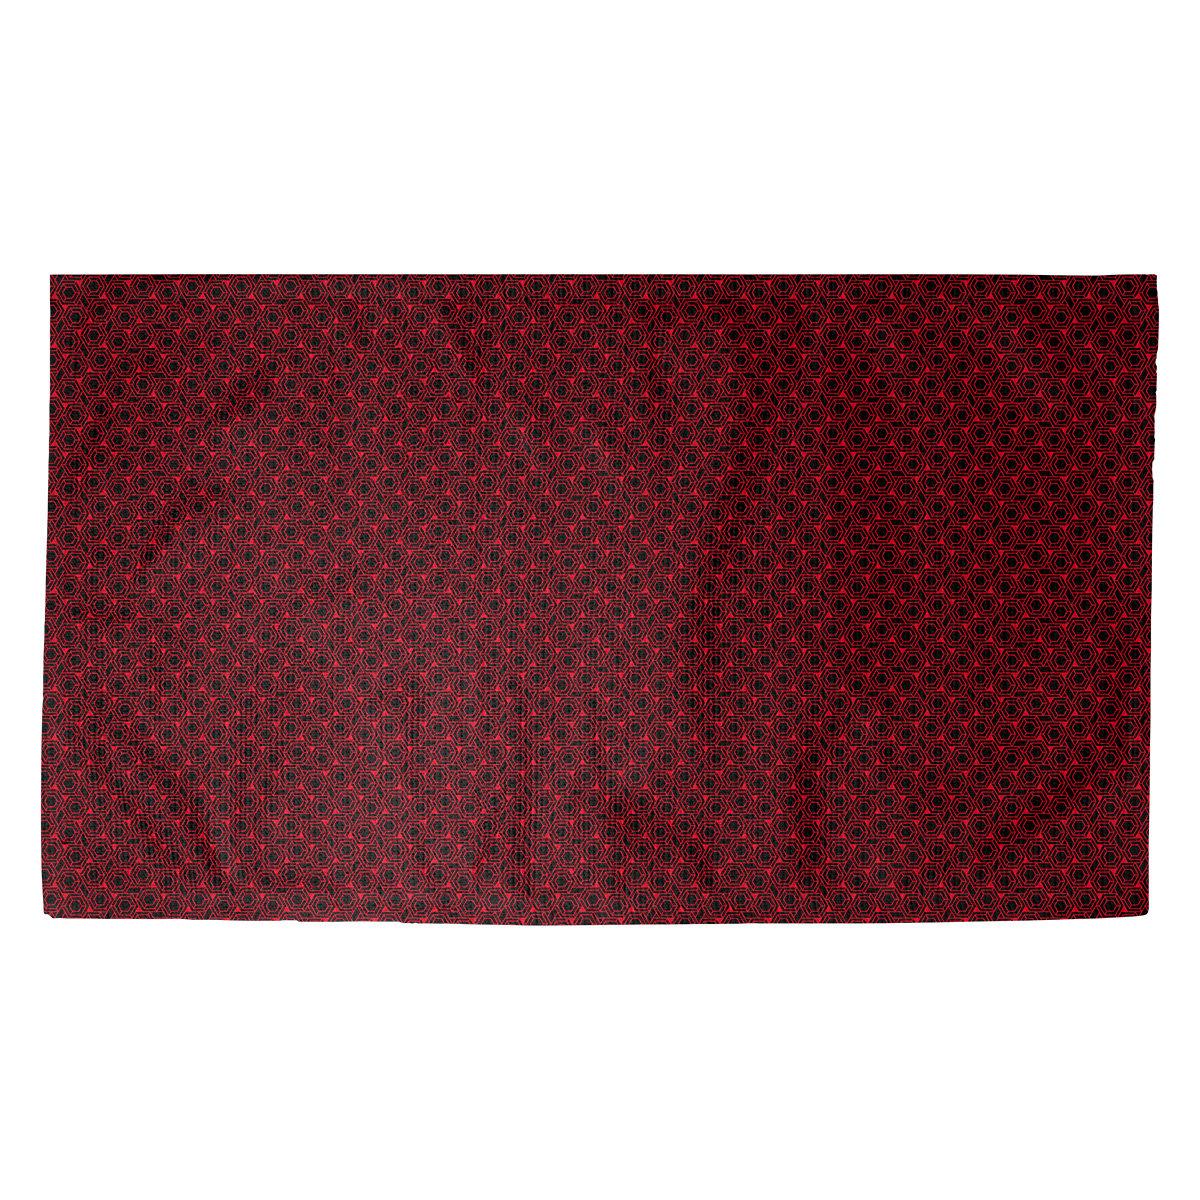 Latitude Run Avicia Hexagonal Lattice Red Black Area Rug Wayfair